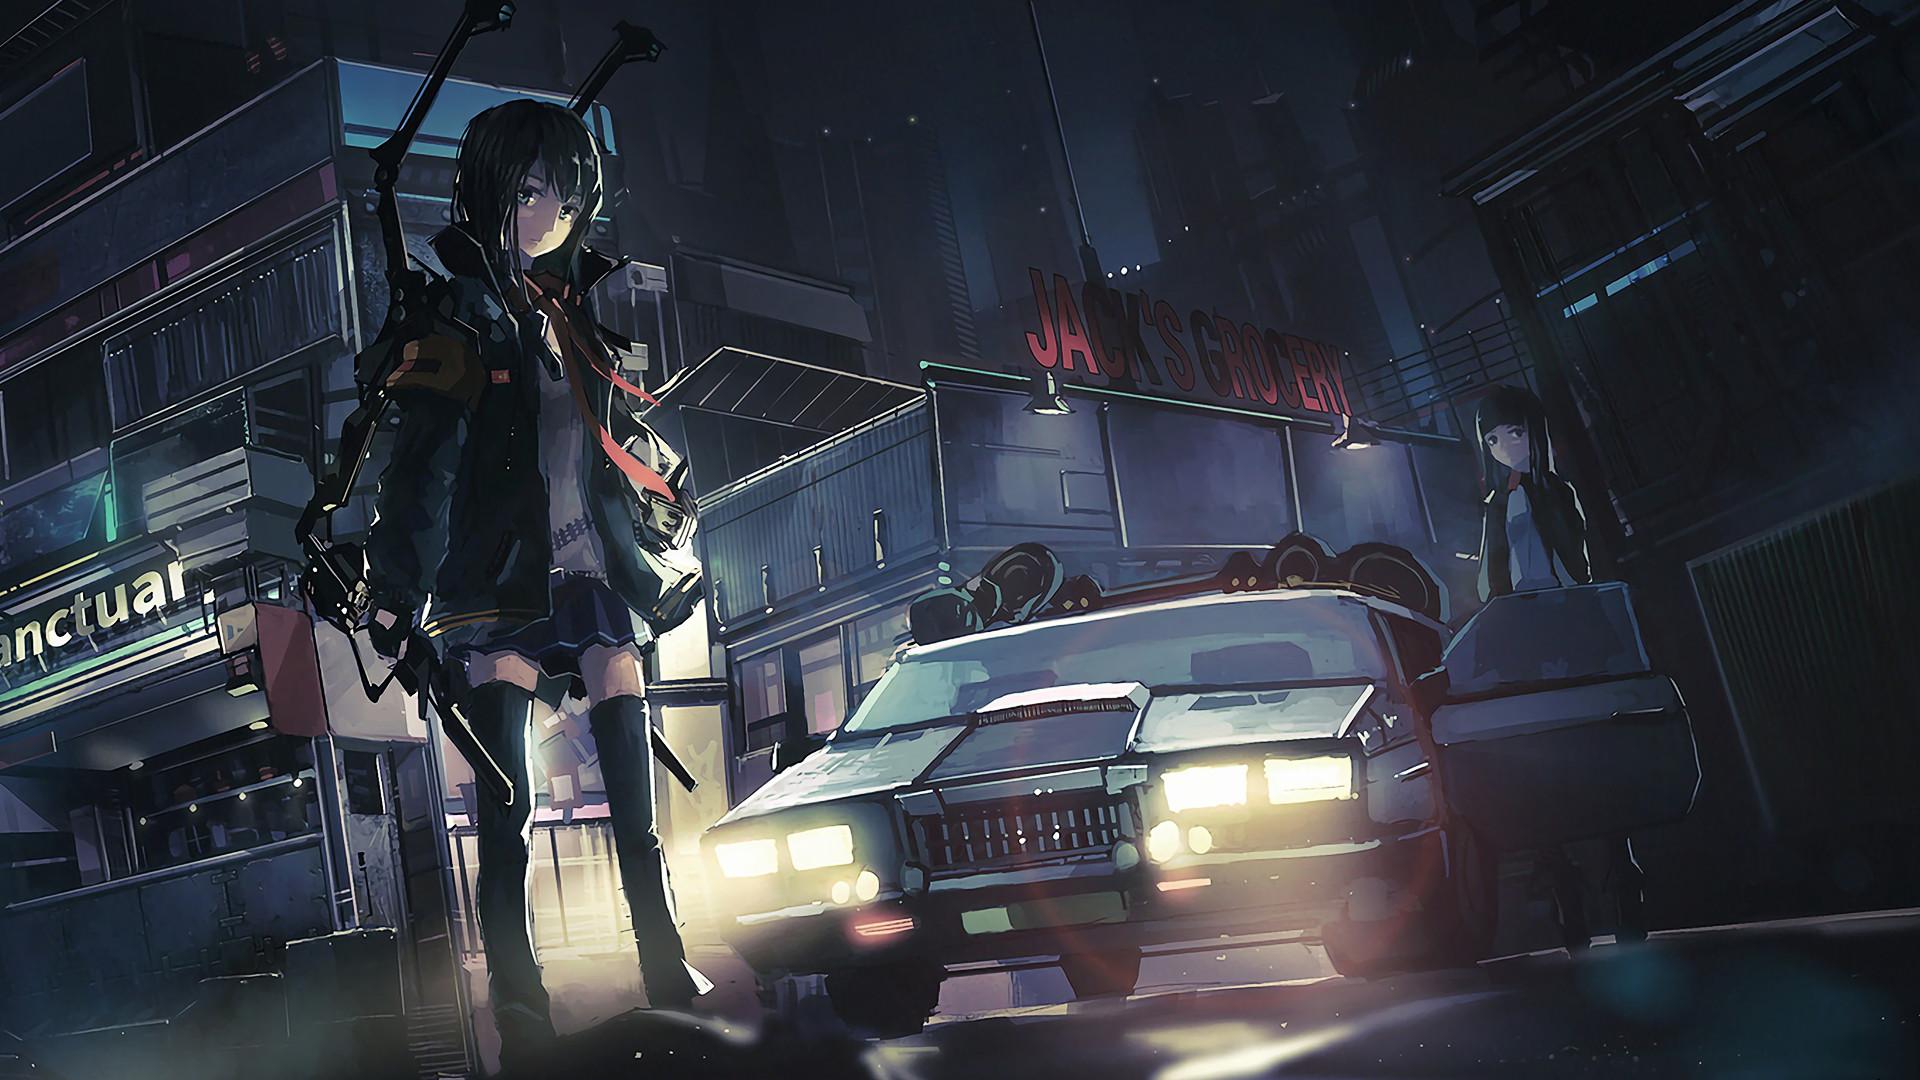 Anime original characters police cars anime anime girls